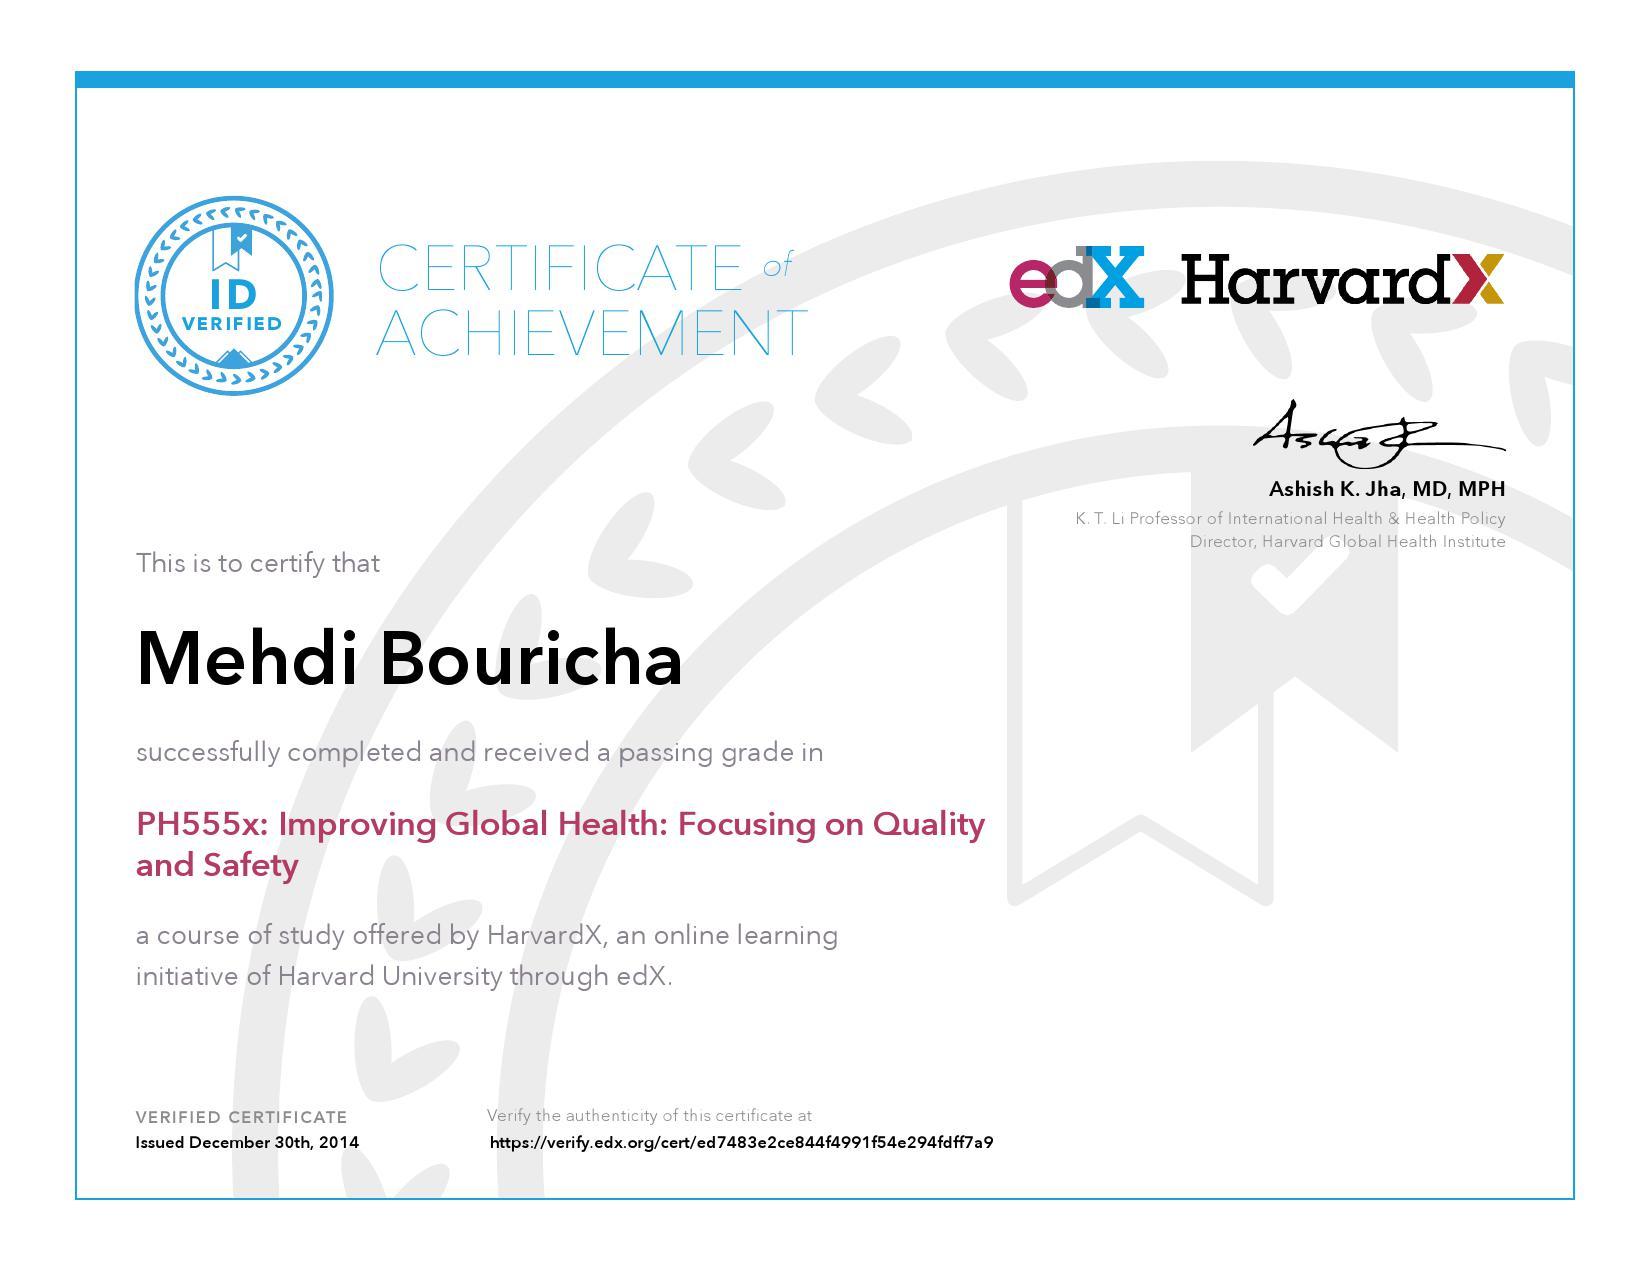 Harvardx Harvard University Ph555x Improving Global Health